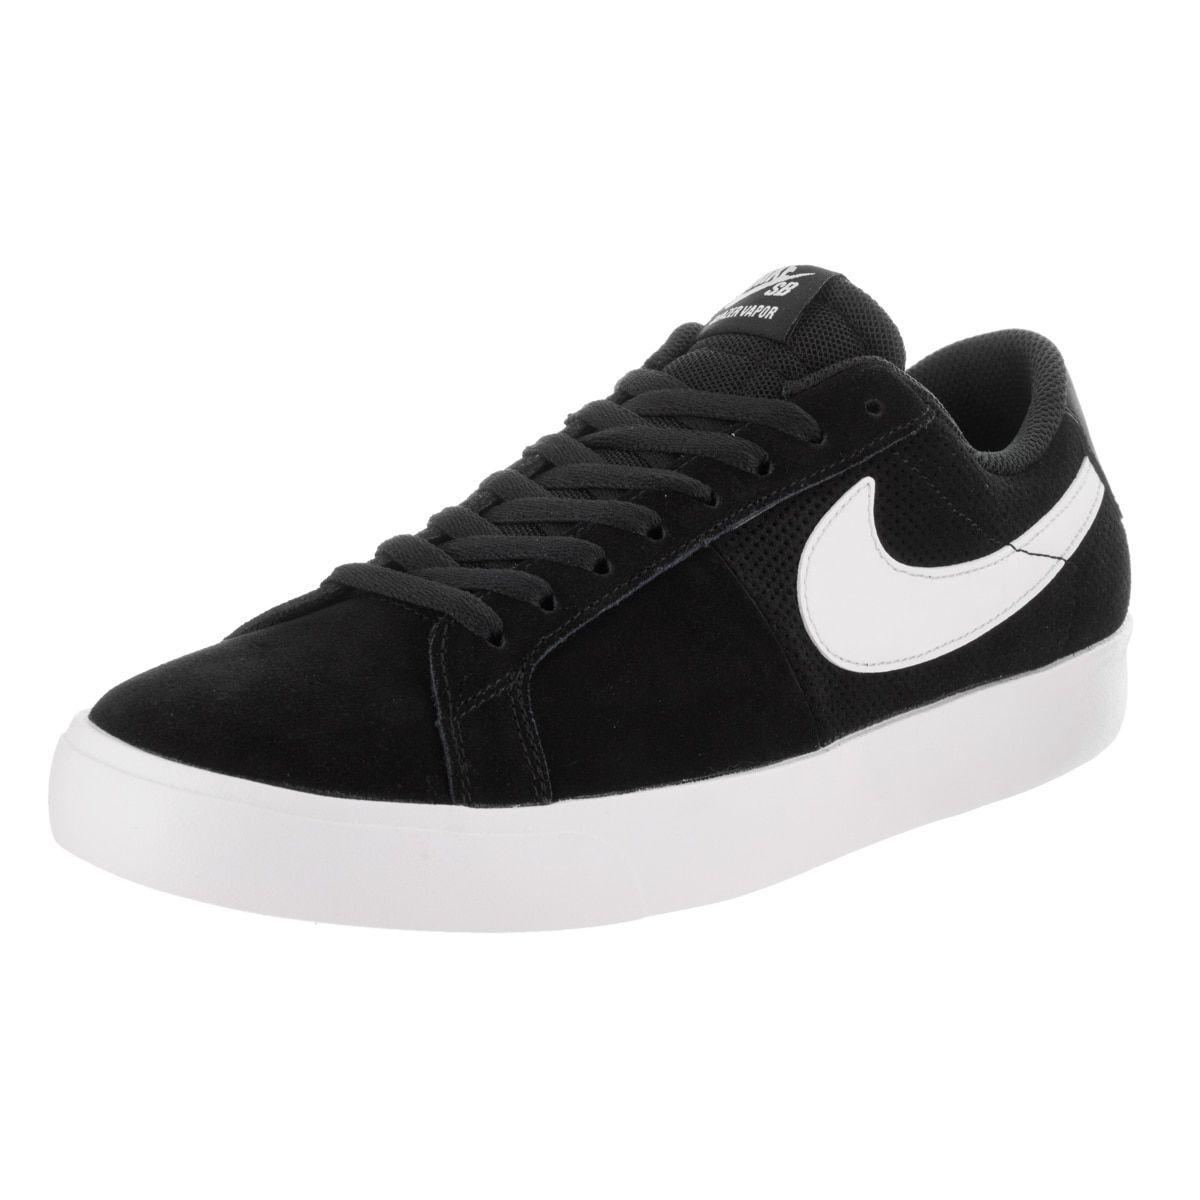 Nike Men's Sb Blazer Vapor Skate Shoe